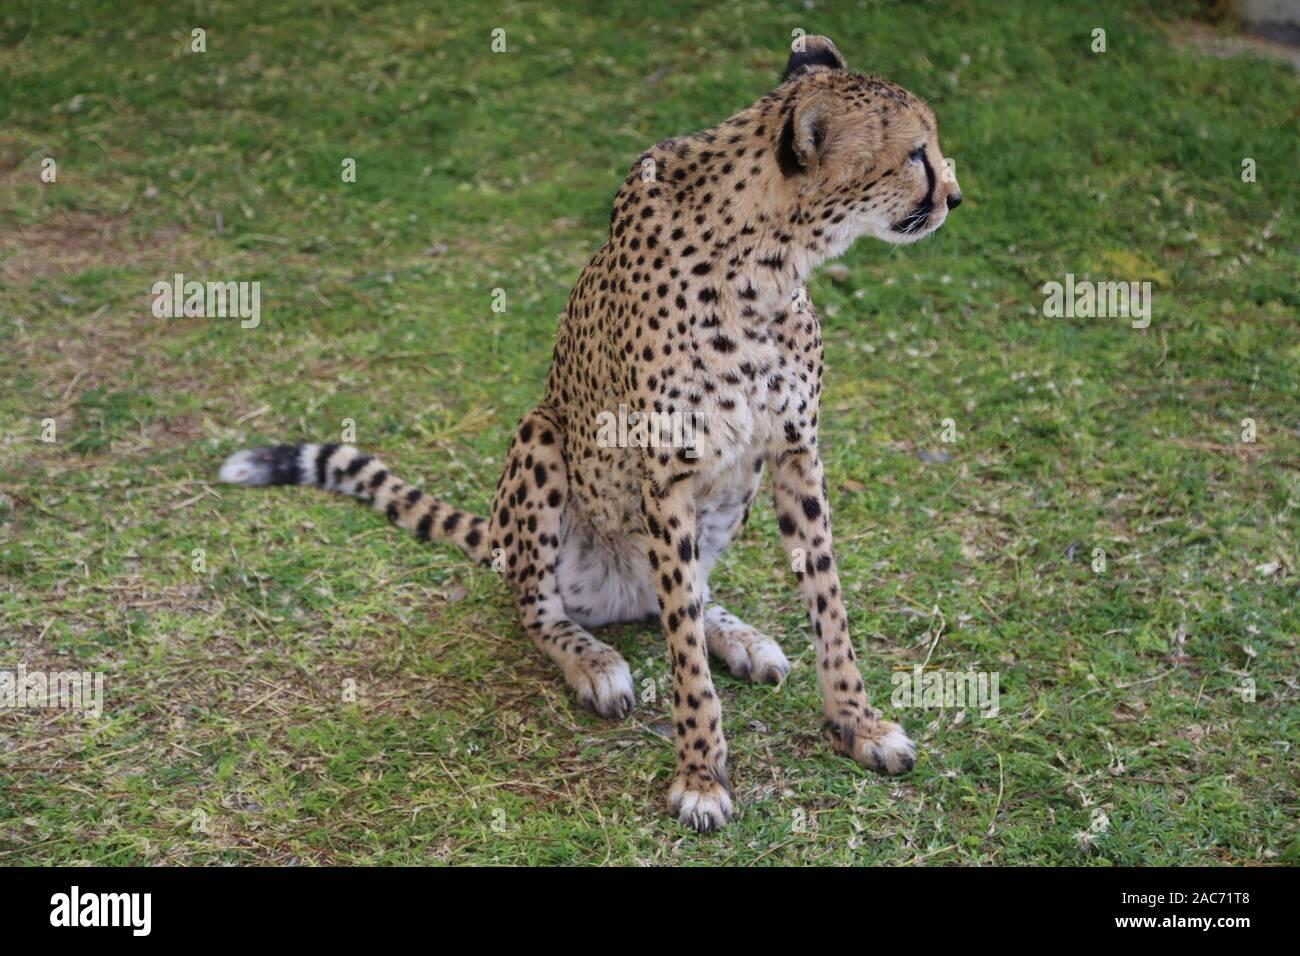 Cheetah in the rehabilitation center in Namibia Stock Photo